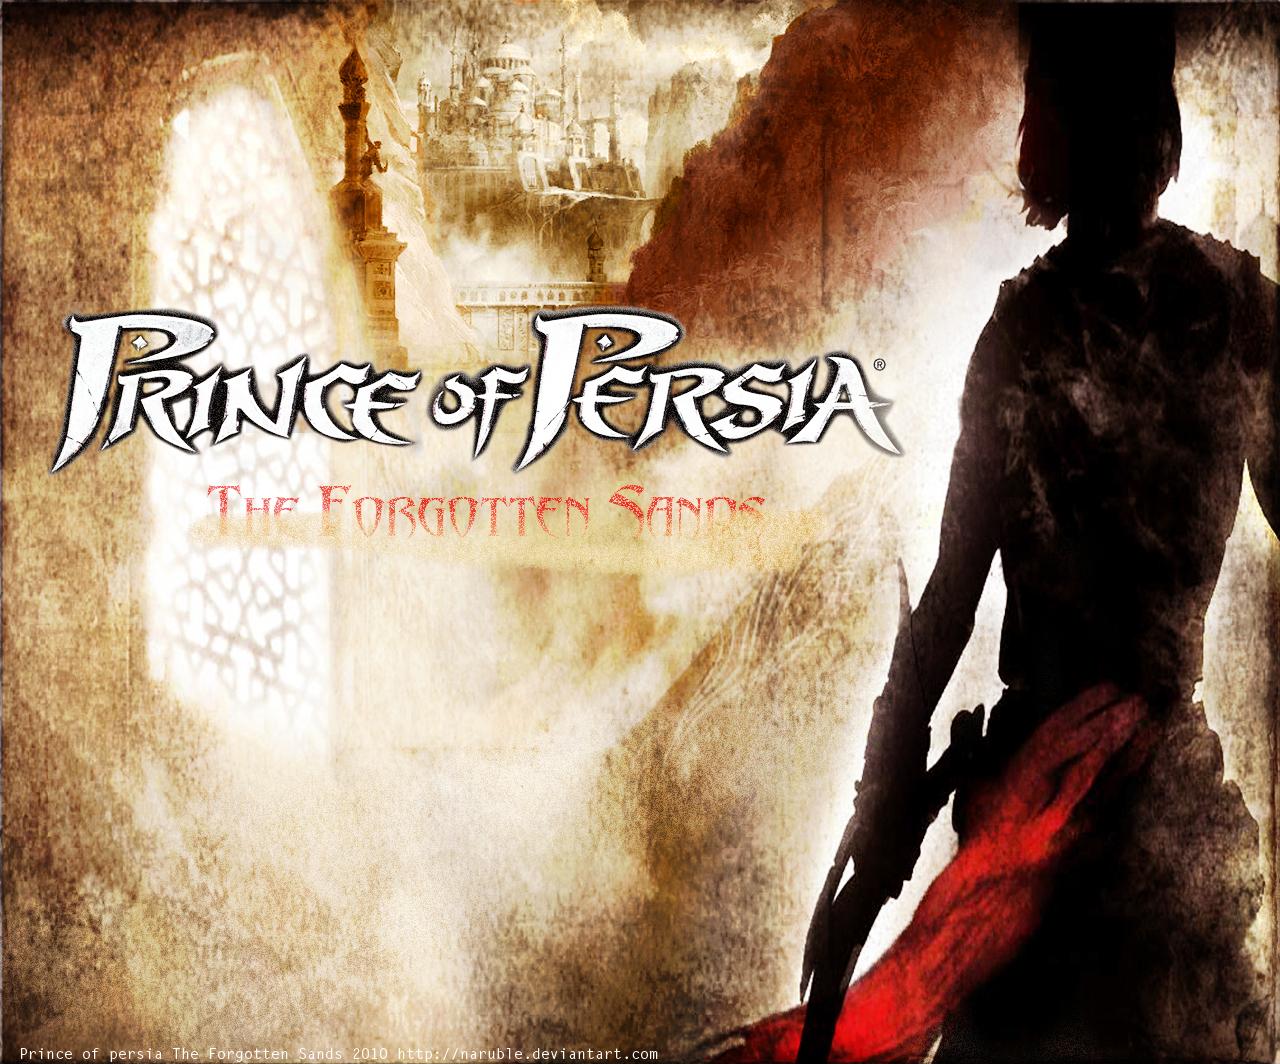 http://fc02.deviantart.net/fs71/f/2010/029/6/b/The_Prince_Of_Persia ...